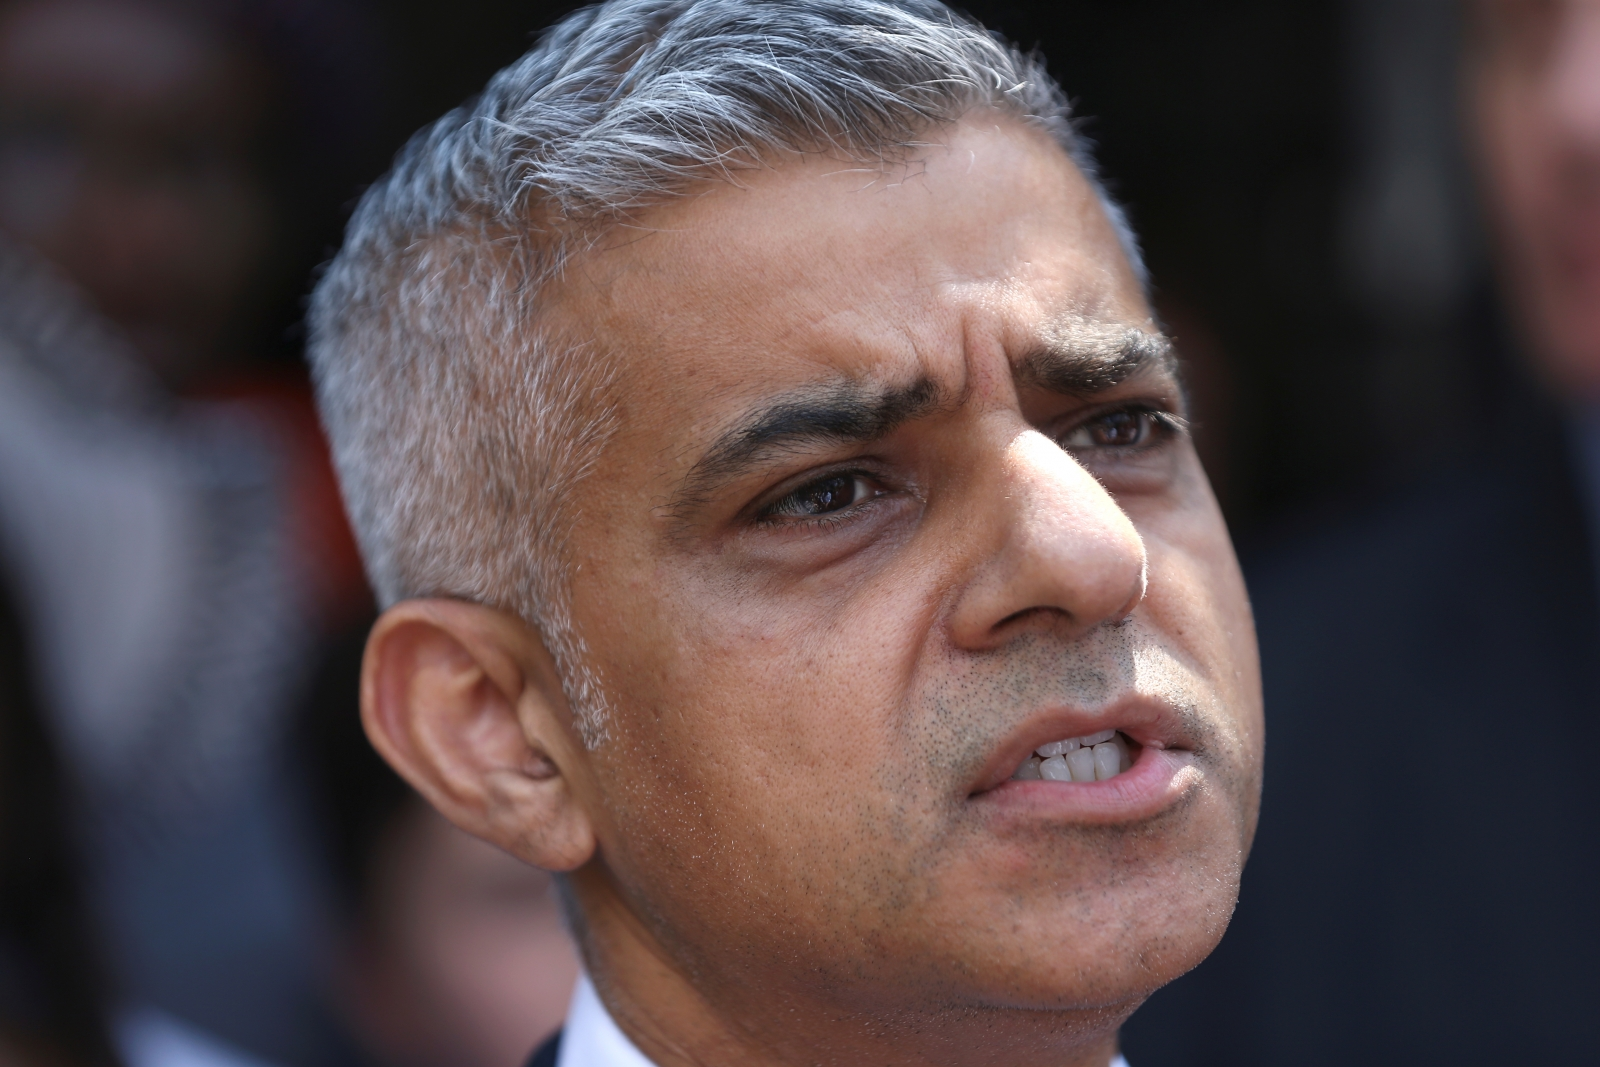 Sadiq Khan tells London: Blame Uber for losing its licence ... Sadiq Khan